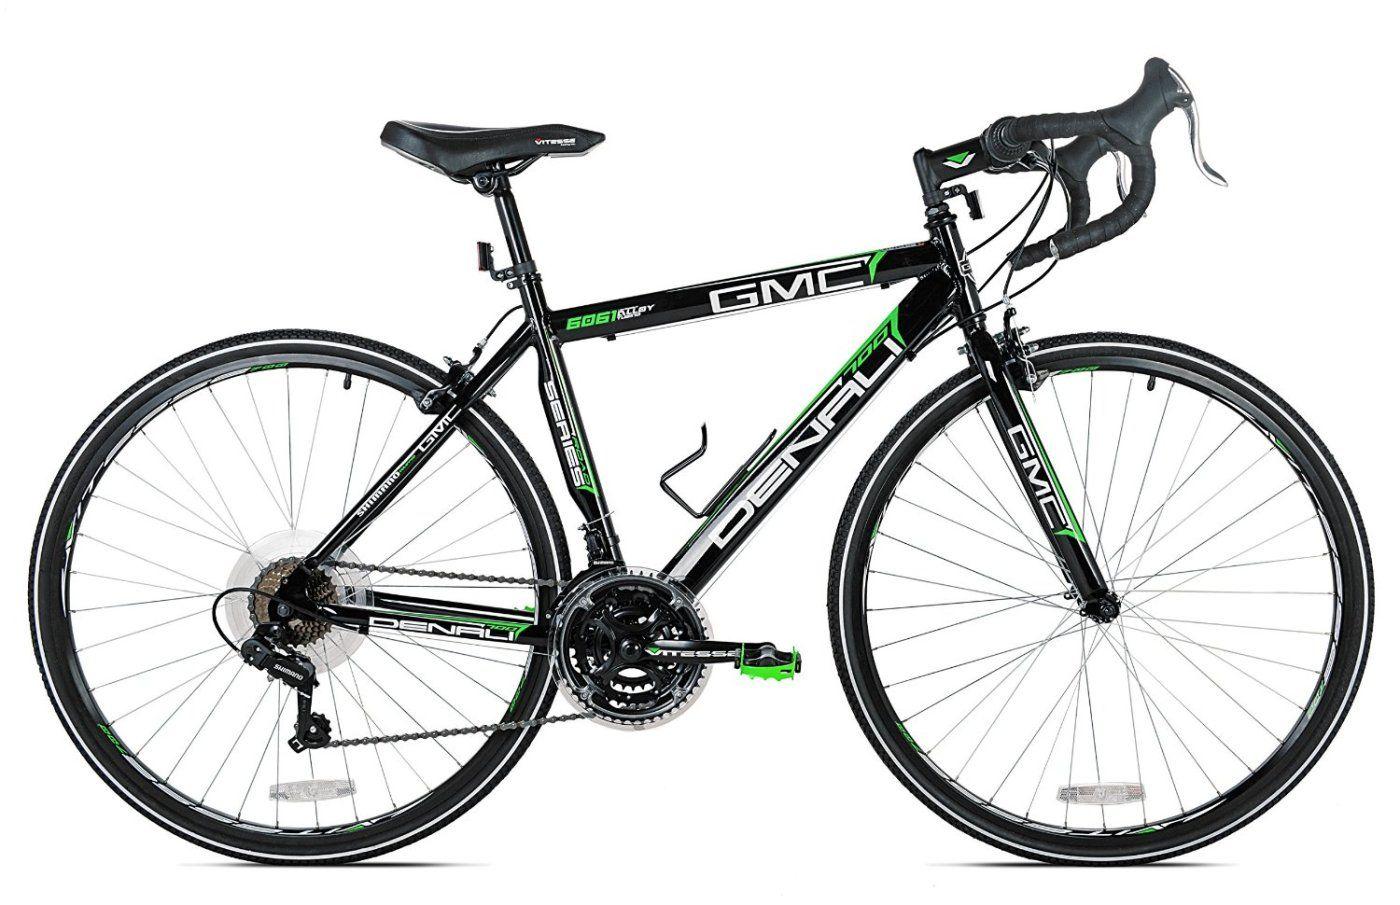 Gmc Denali Road Bike Review Gmc Road Bike Experience